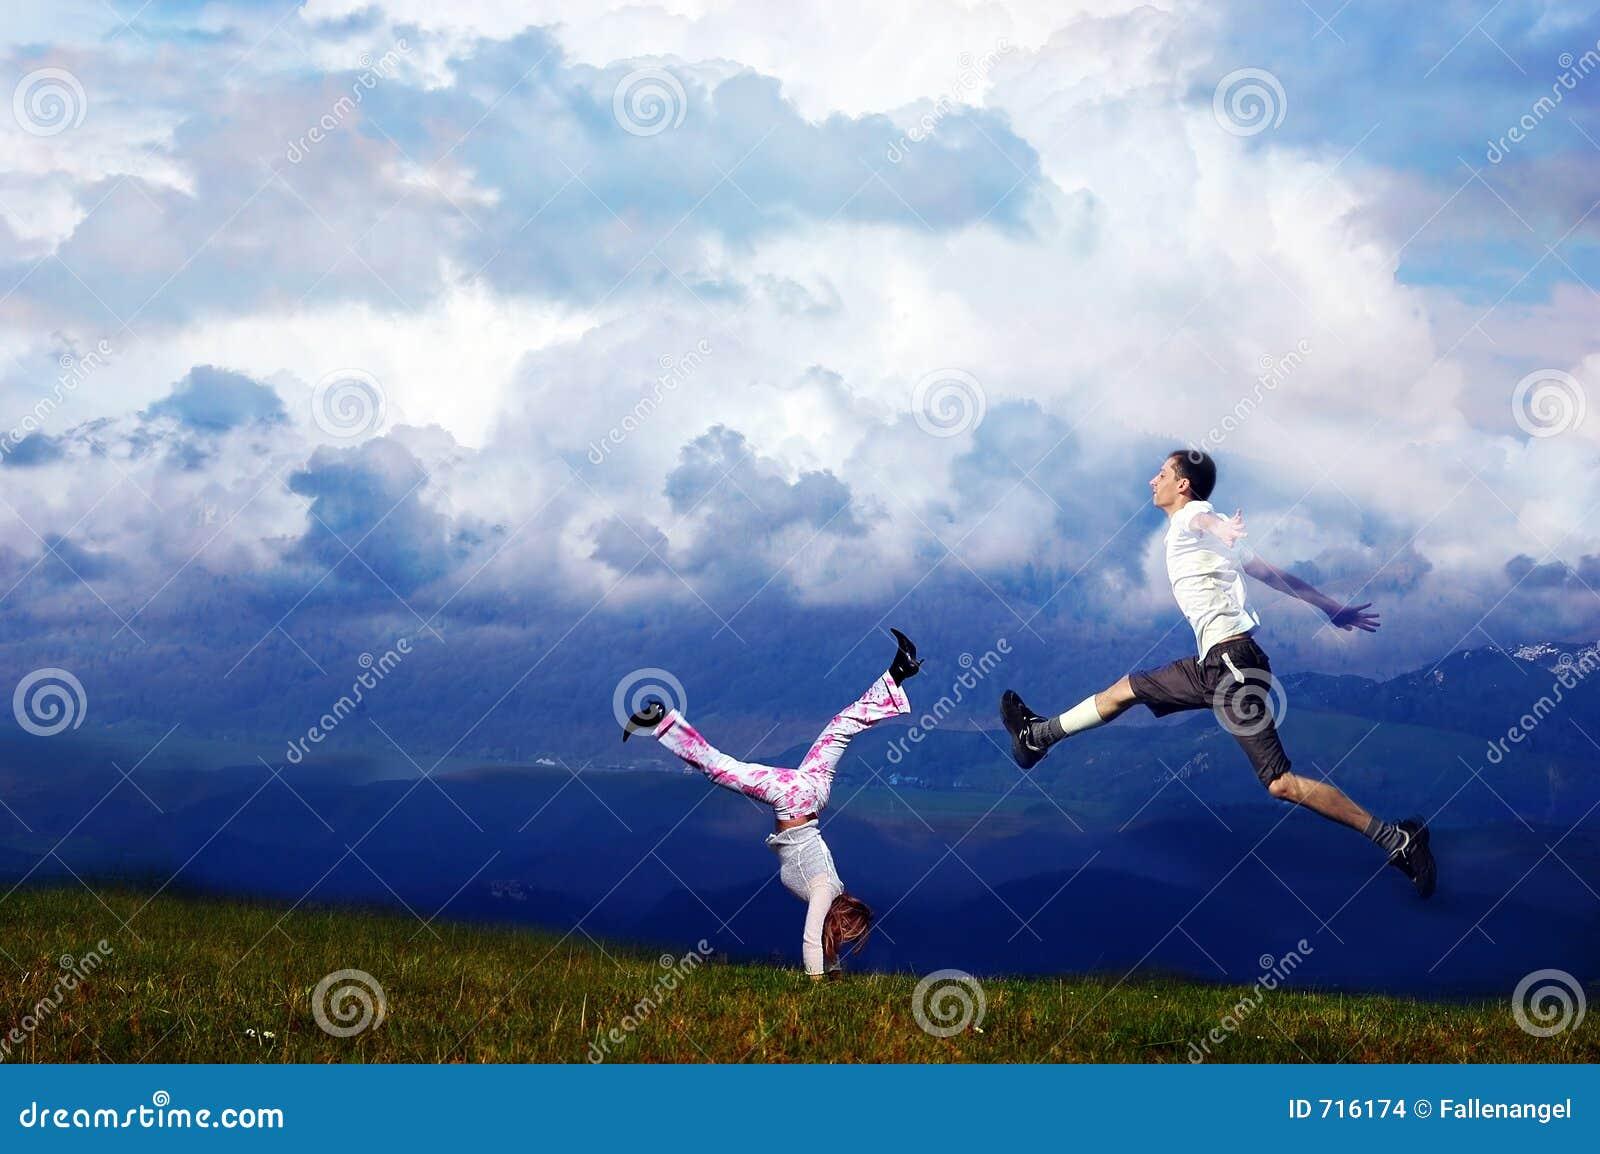 Runing in air